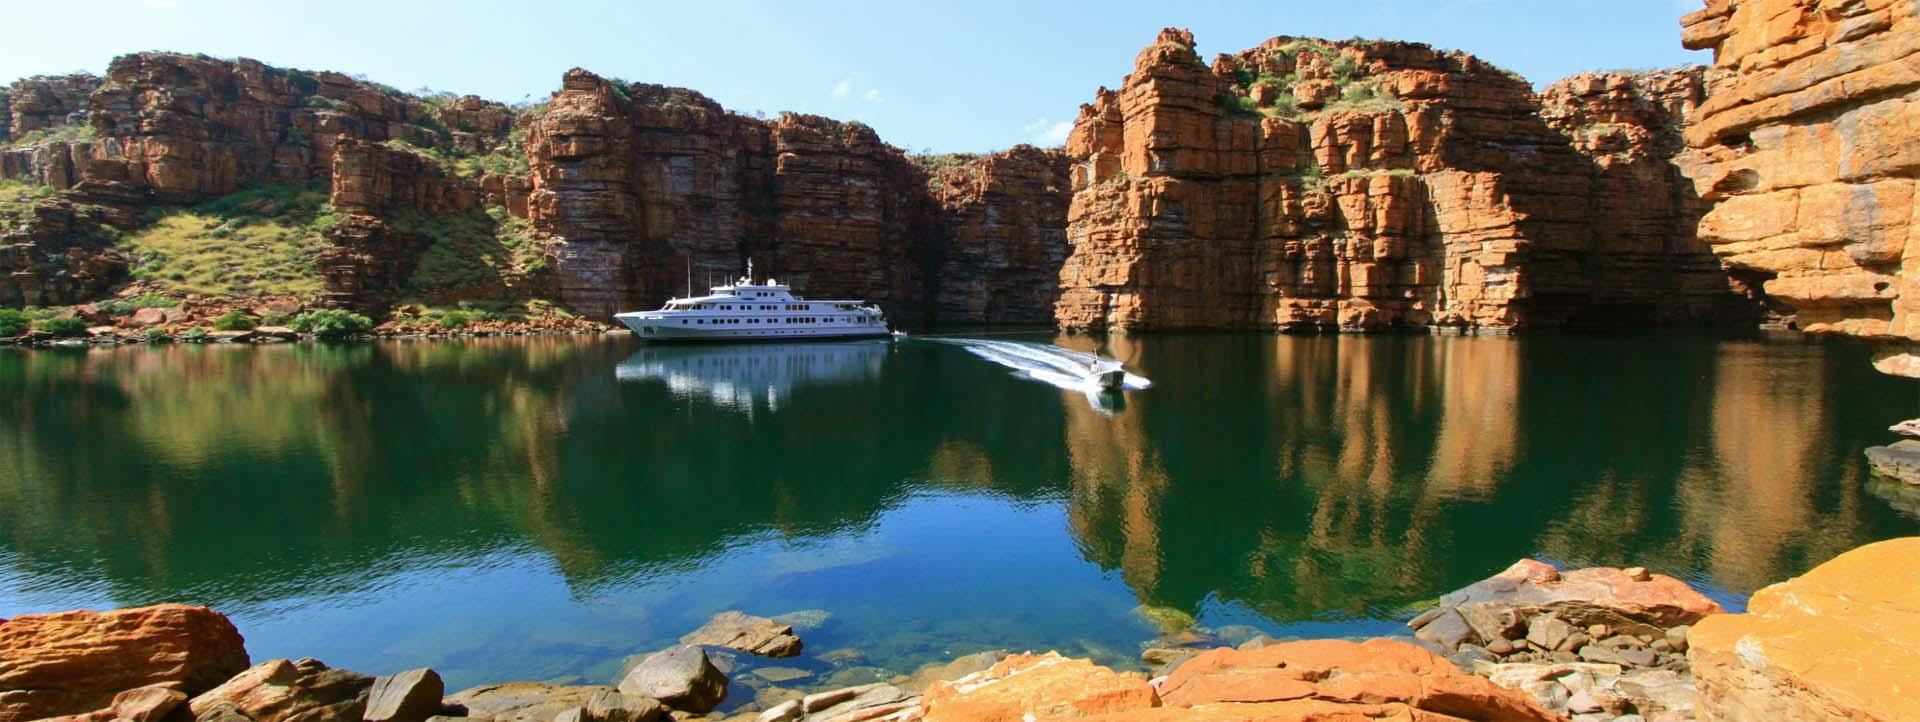 TRUE NORTH Kimberley cruises King George Falls